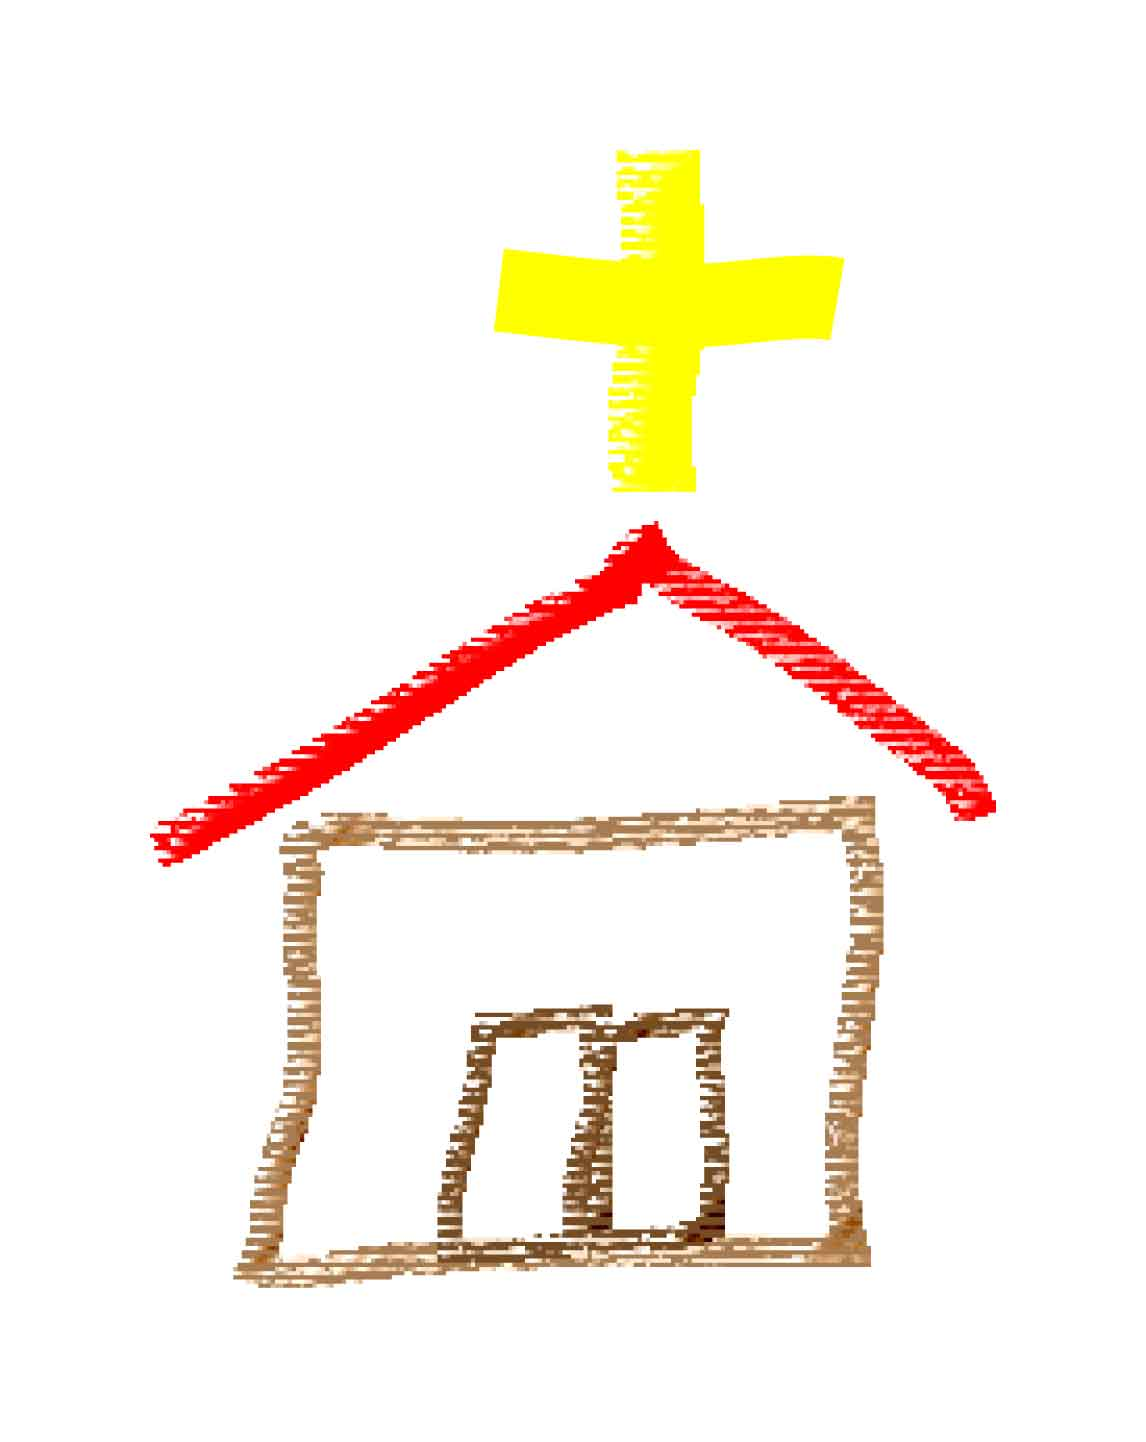 Child's-Drawing.jpg